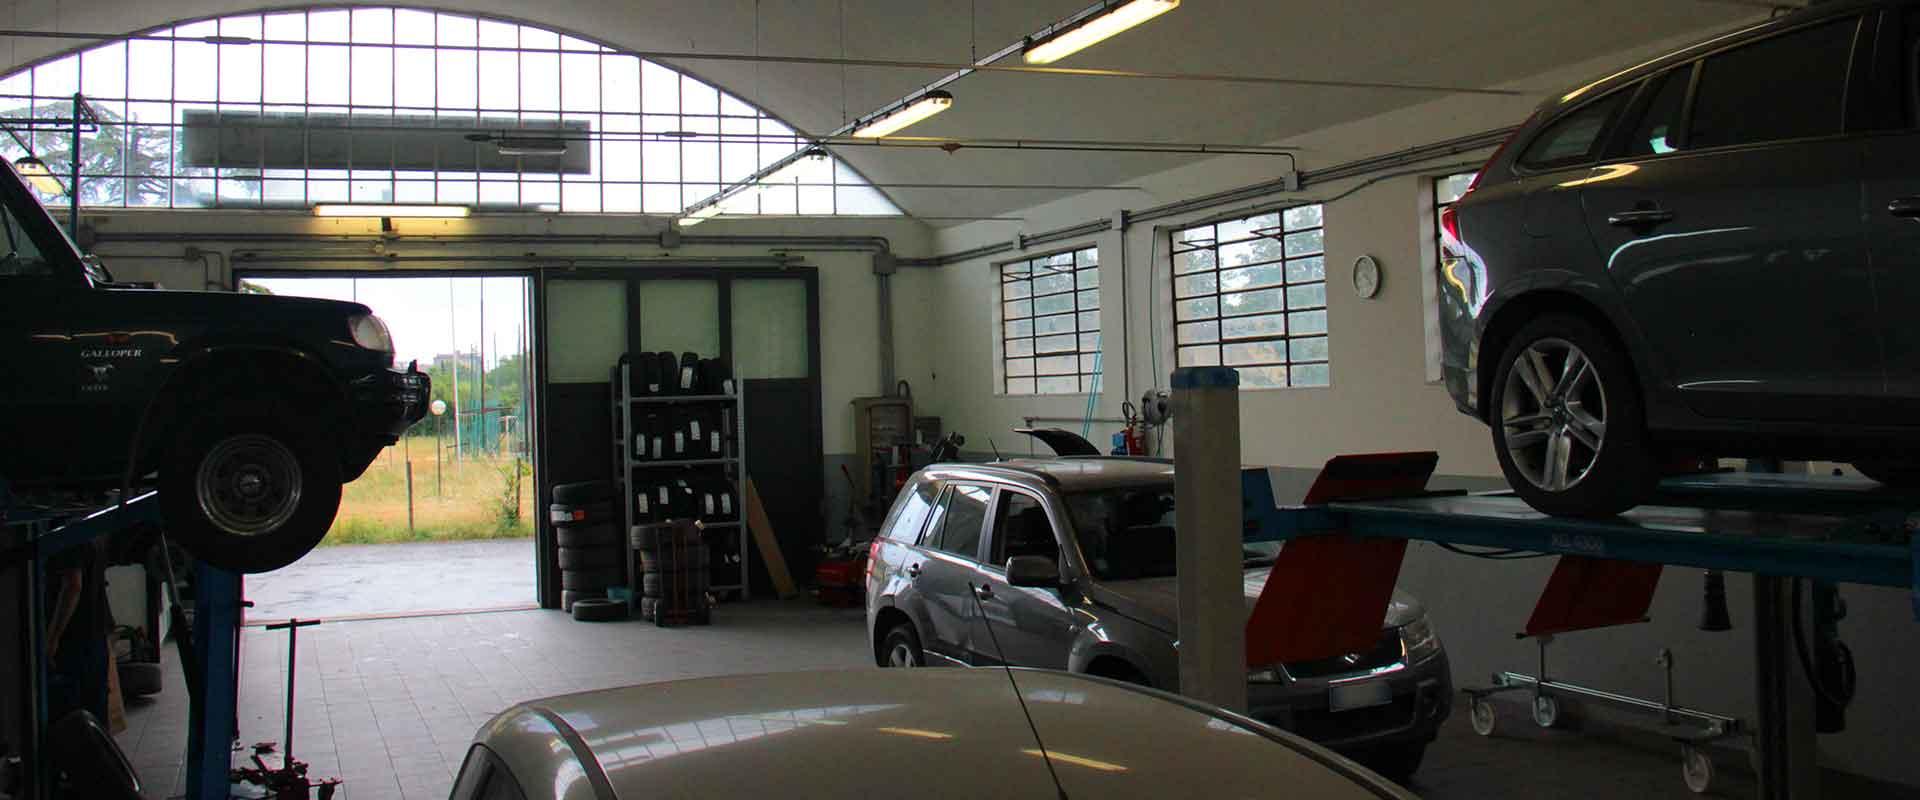 Autofficina Ford Castelfiorentino Empoli Certaldo Gambassi